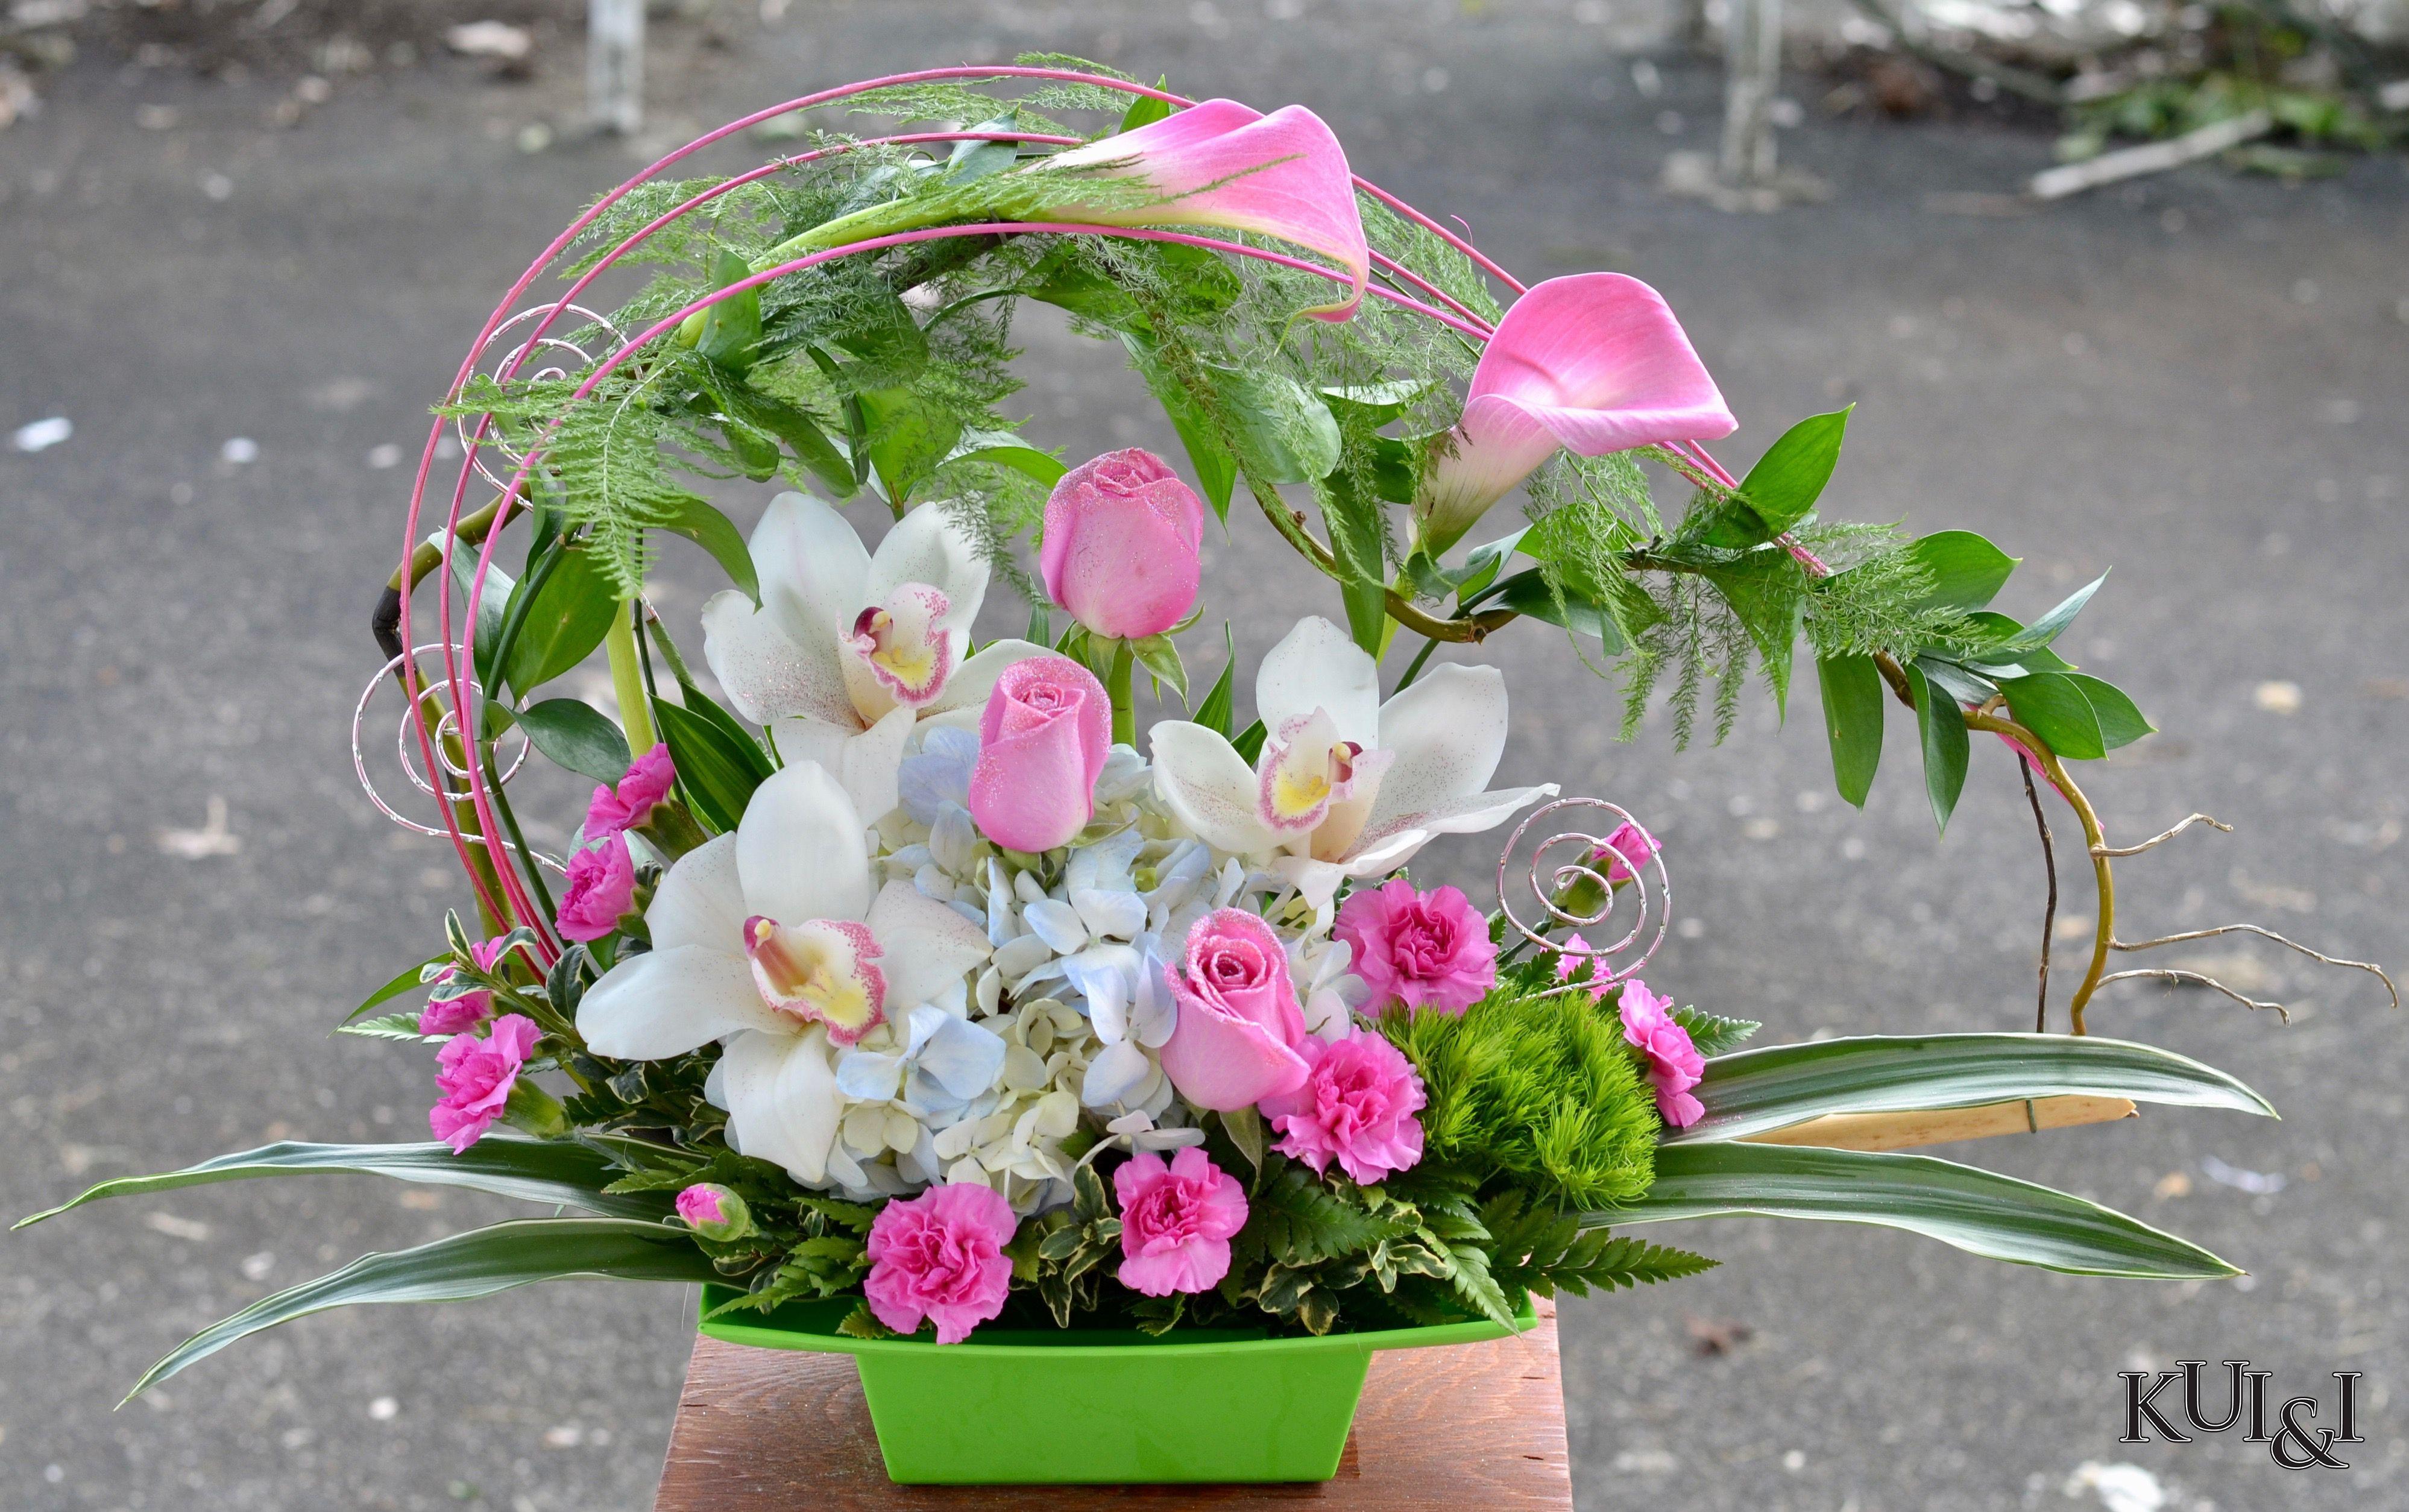 Pink & White Armature Arrangement Kui & I Florist, Llc